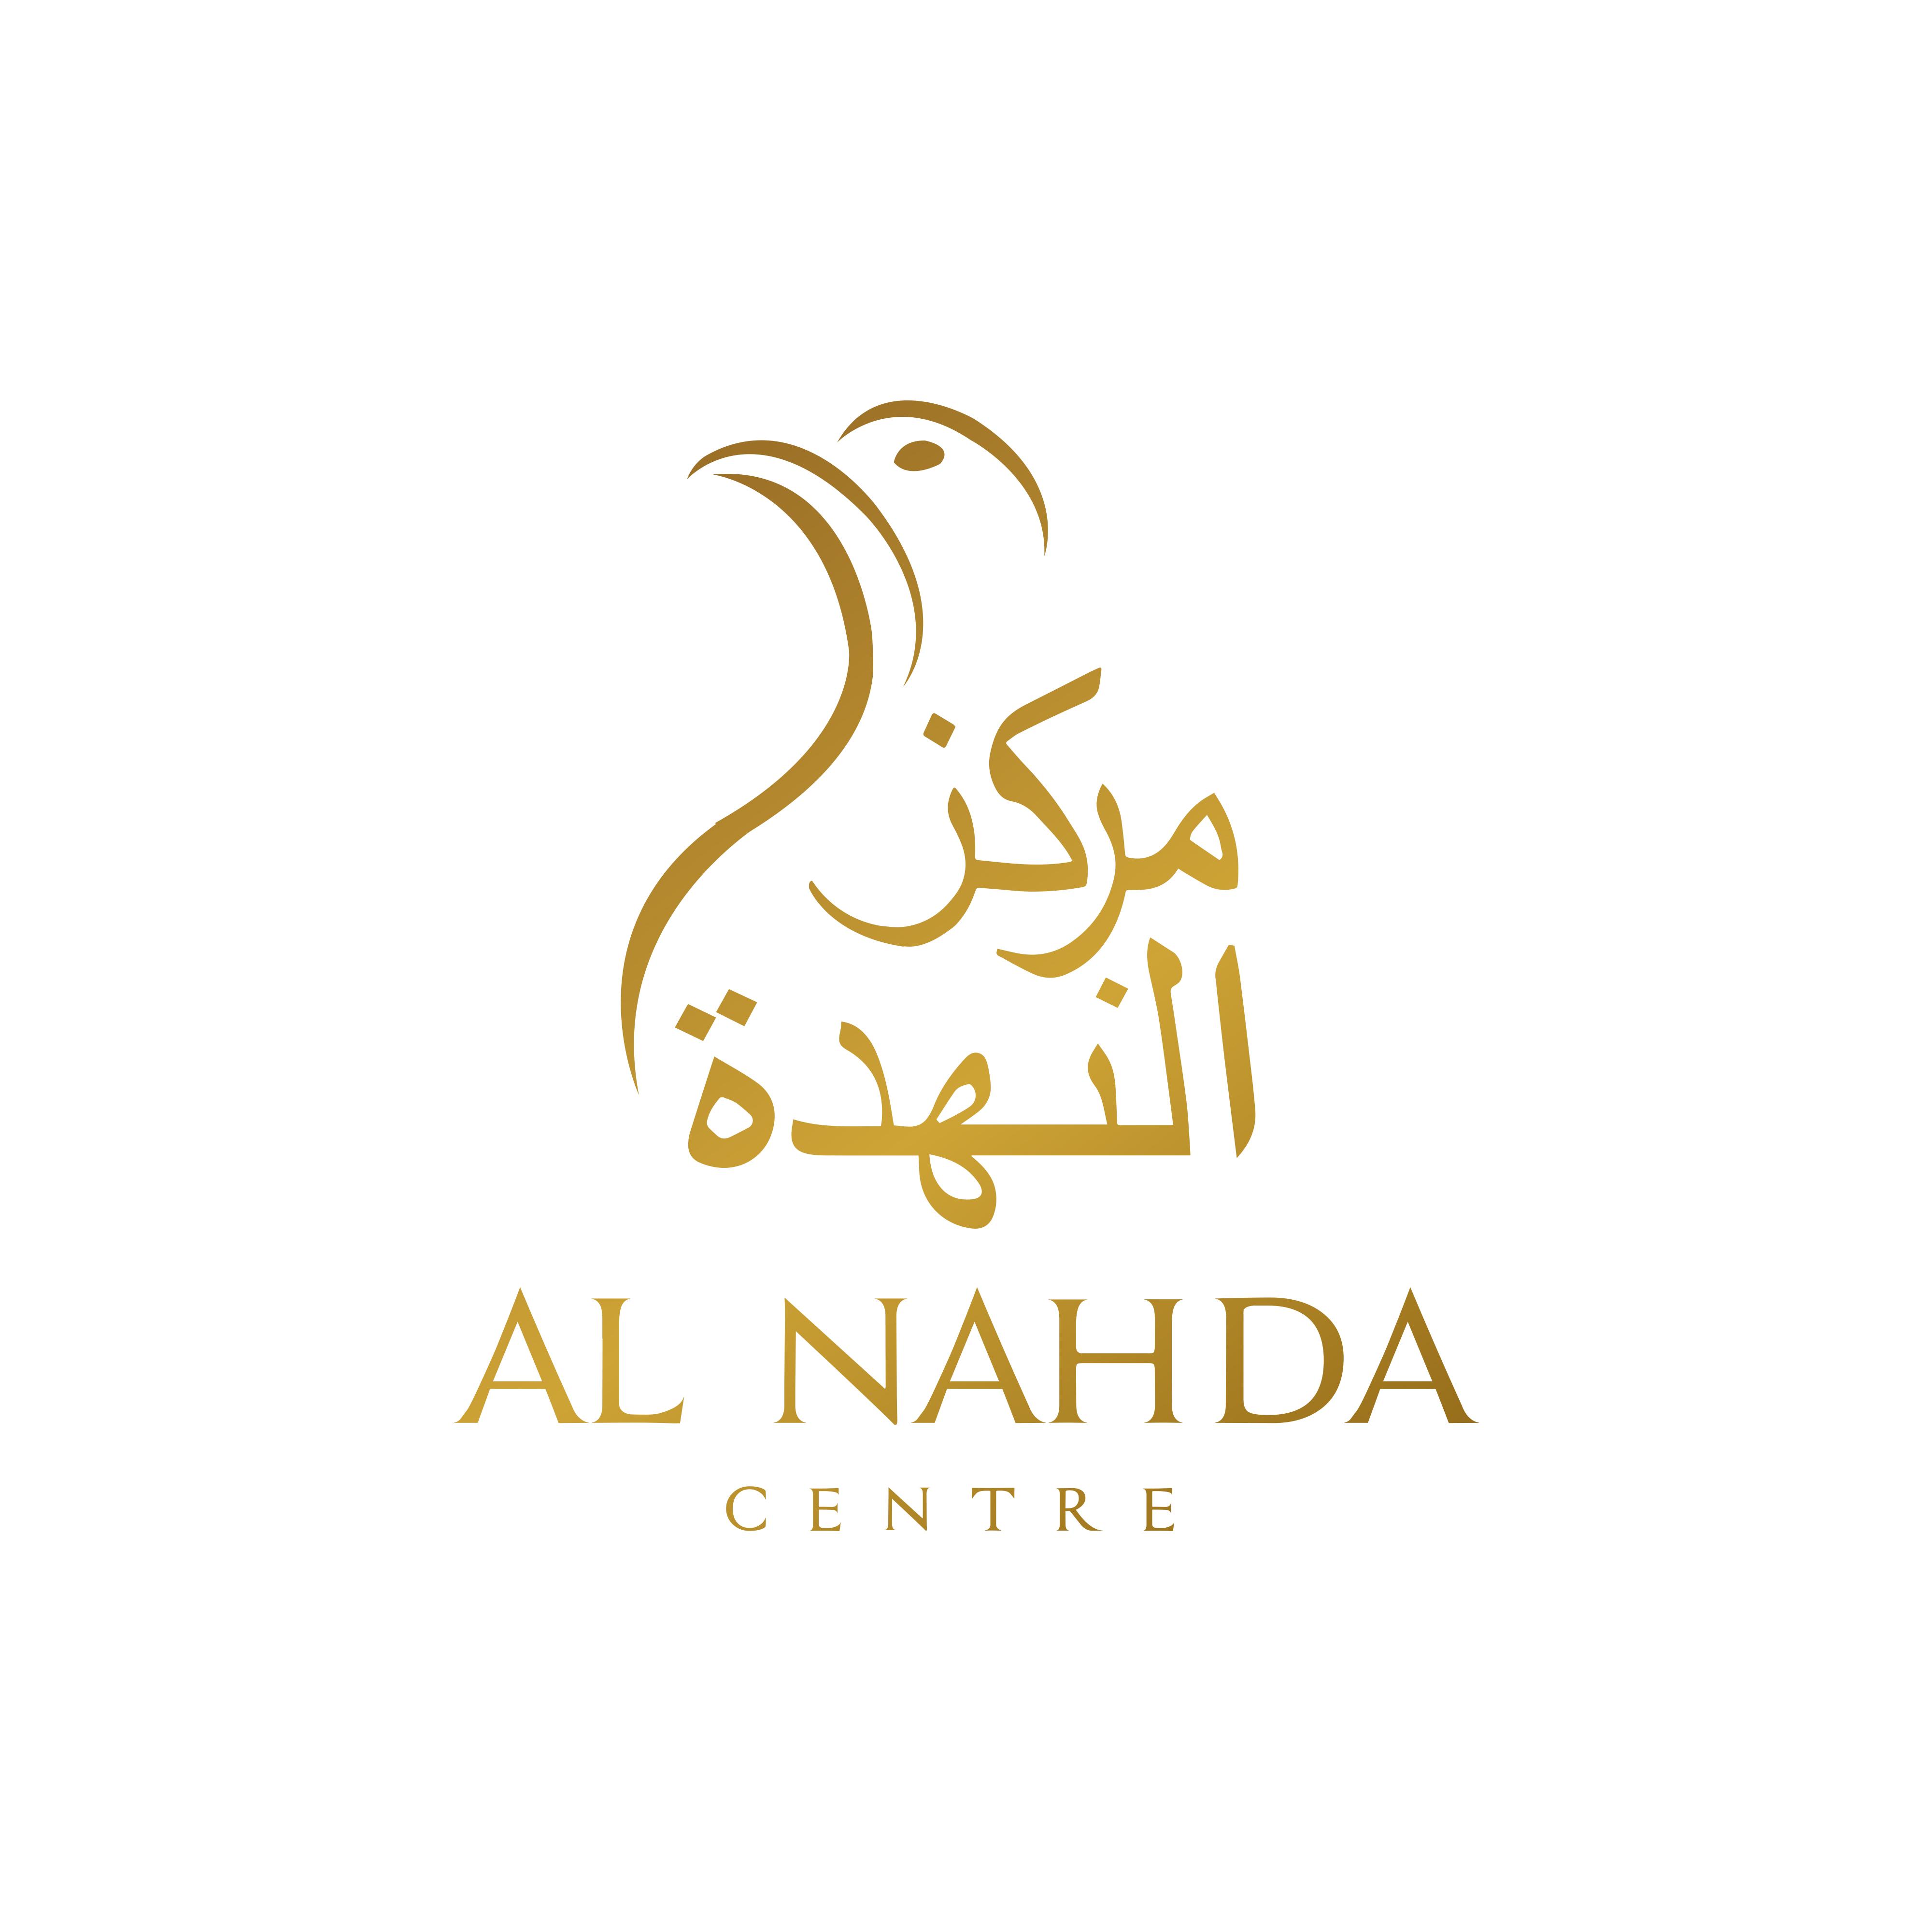 Al Nahda Centre